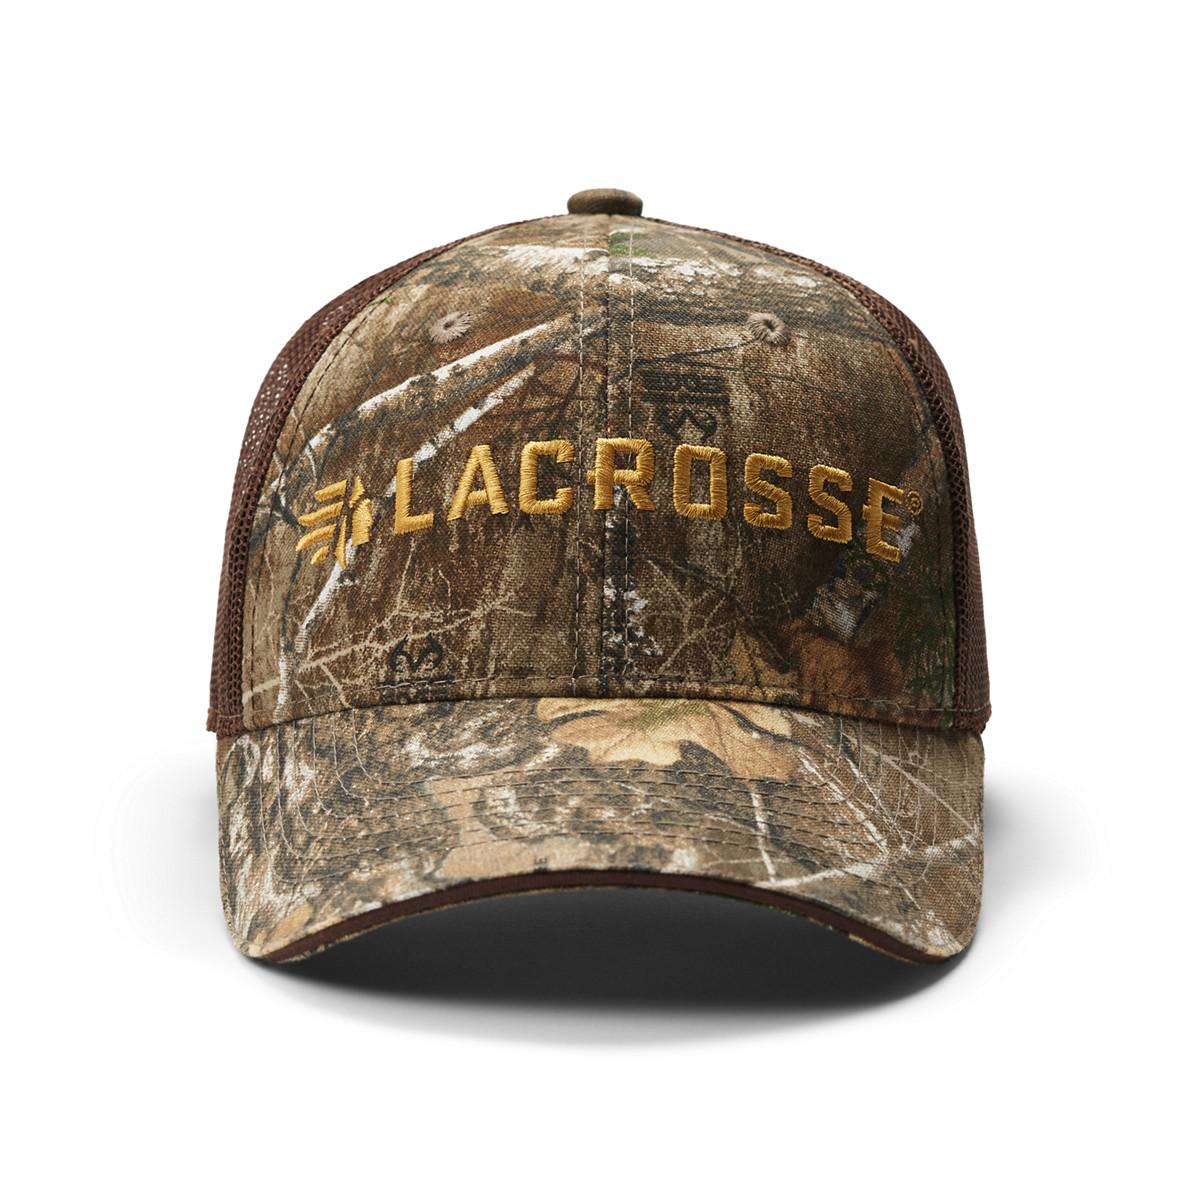 df2229bc LaCrosse Footwear - LaCrosse Camo Mesh Back Hat Realtree Edge